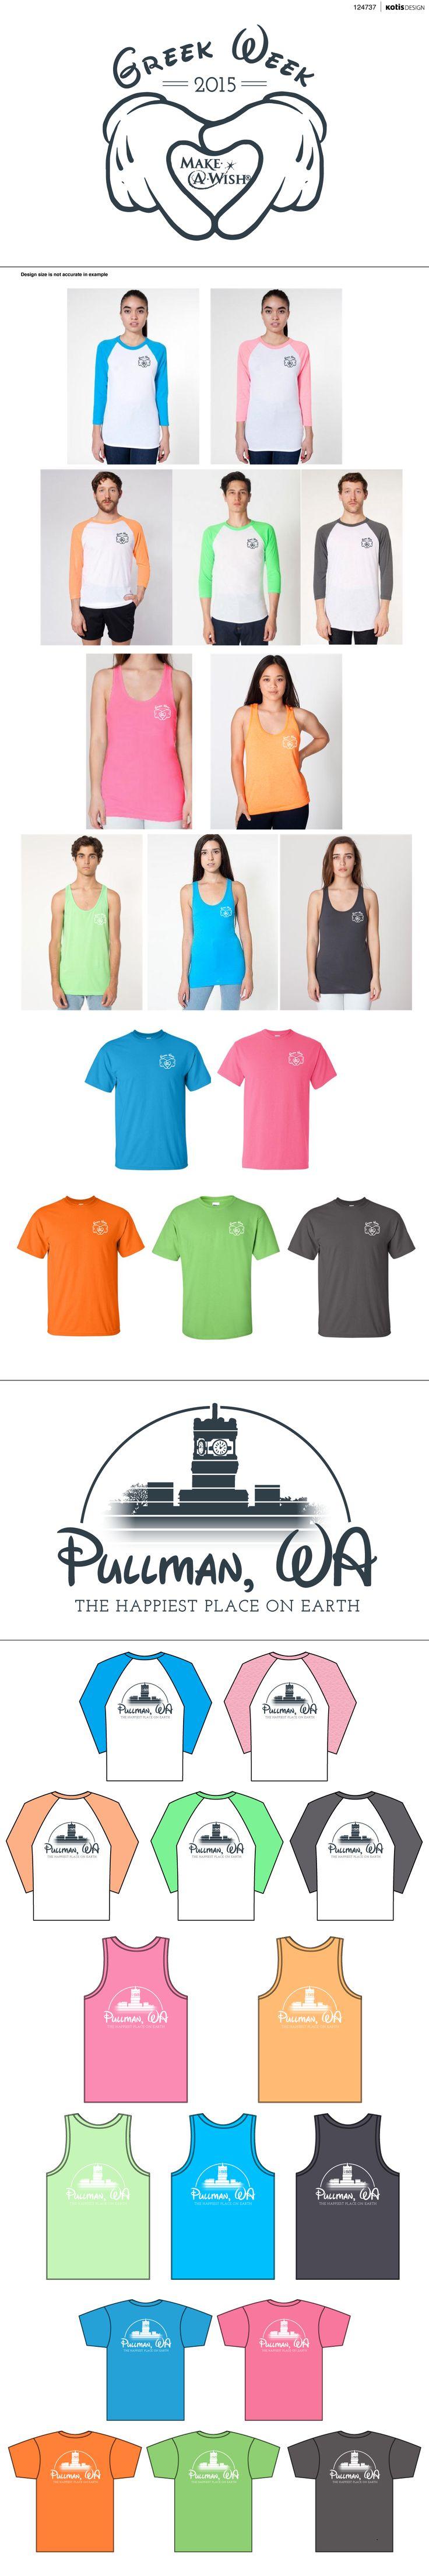 124737 - WSU Greek Week | All-Greek Shirts '15 - View Proof - Kotis Design